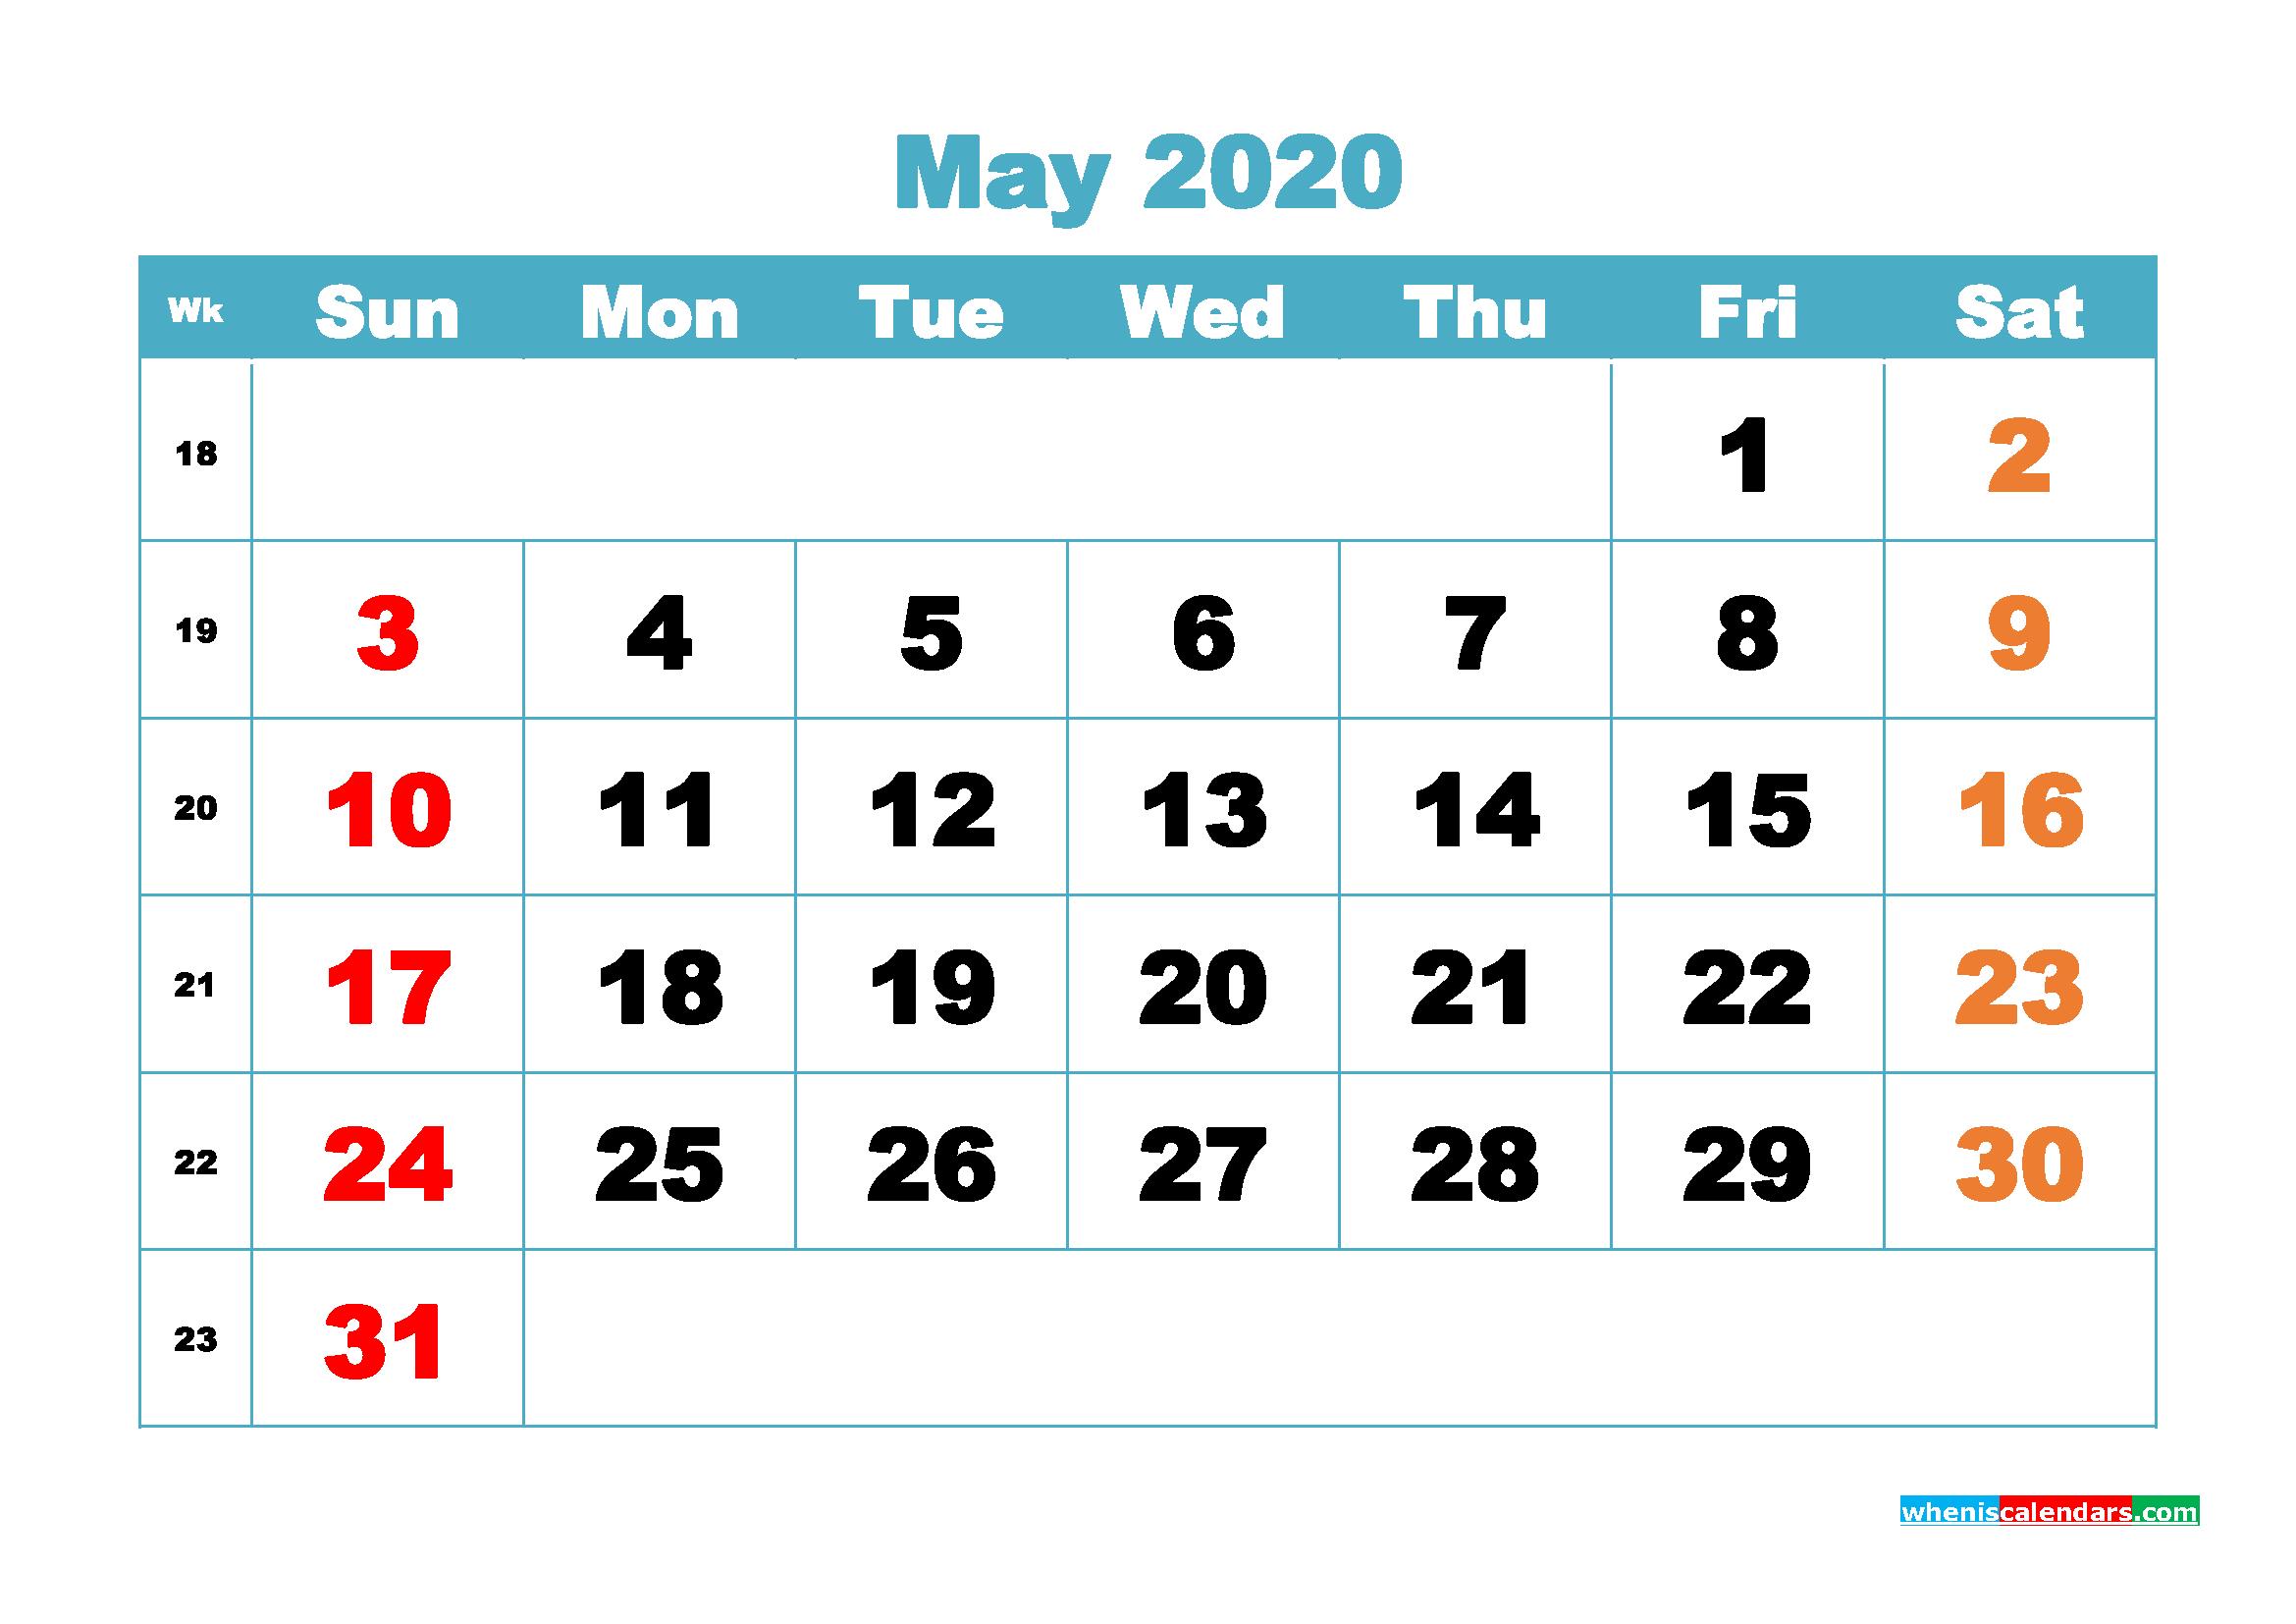 2020 Blank Calendar Template from www.wheniscalendars.com